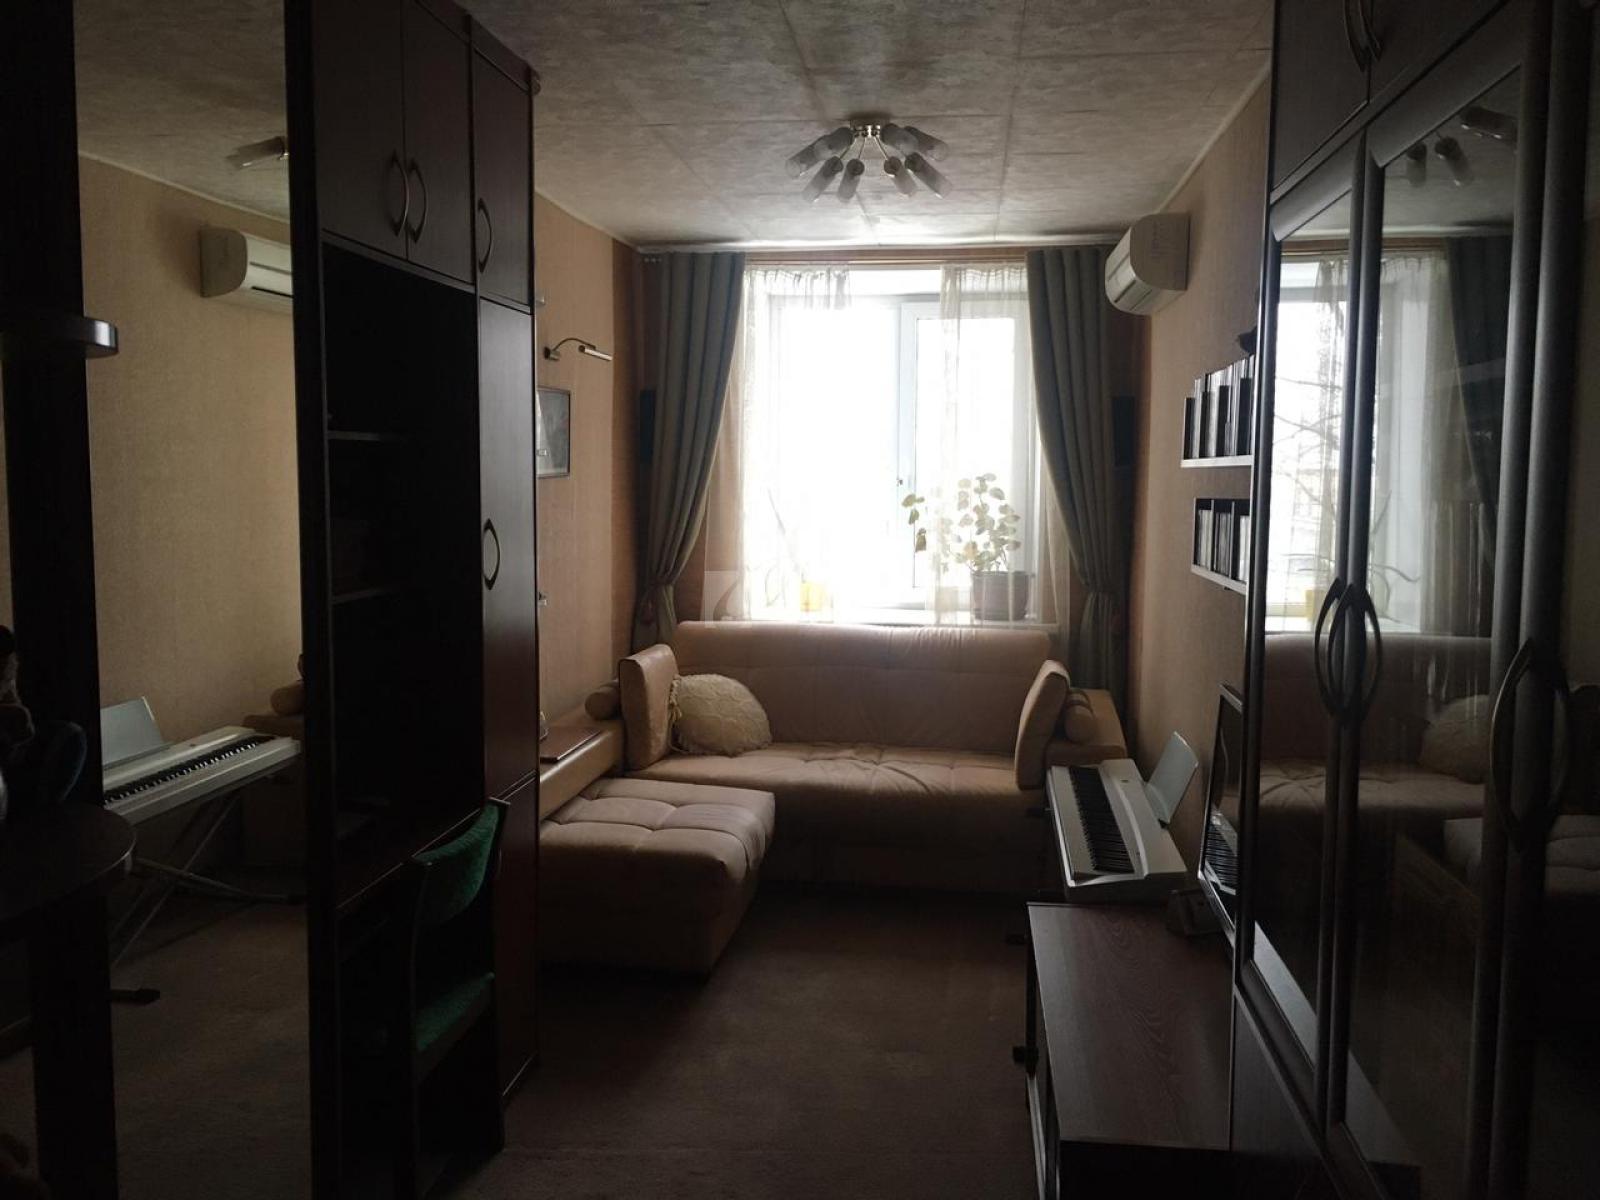 Фото №1 - 3-комнатная квартира, Москва, Солнечногорский проезд 5 корпус 1, метро Беломорская